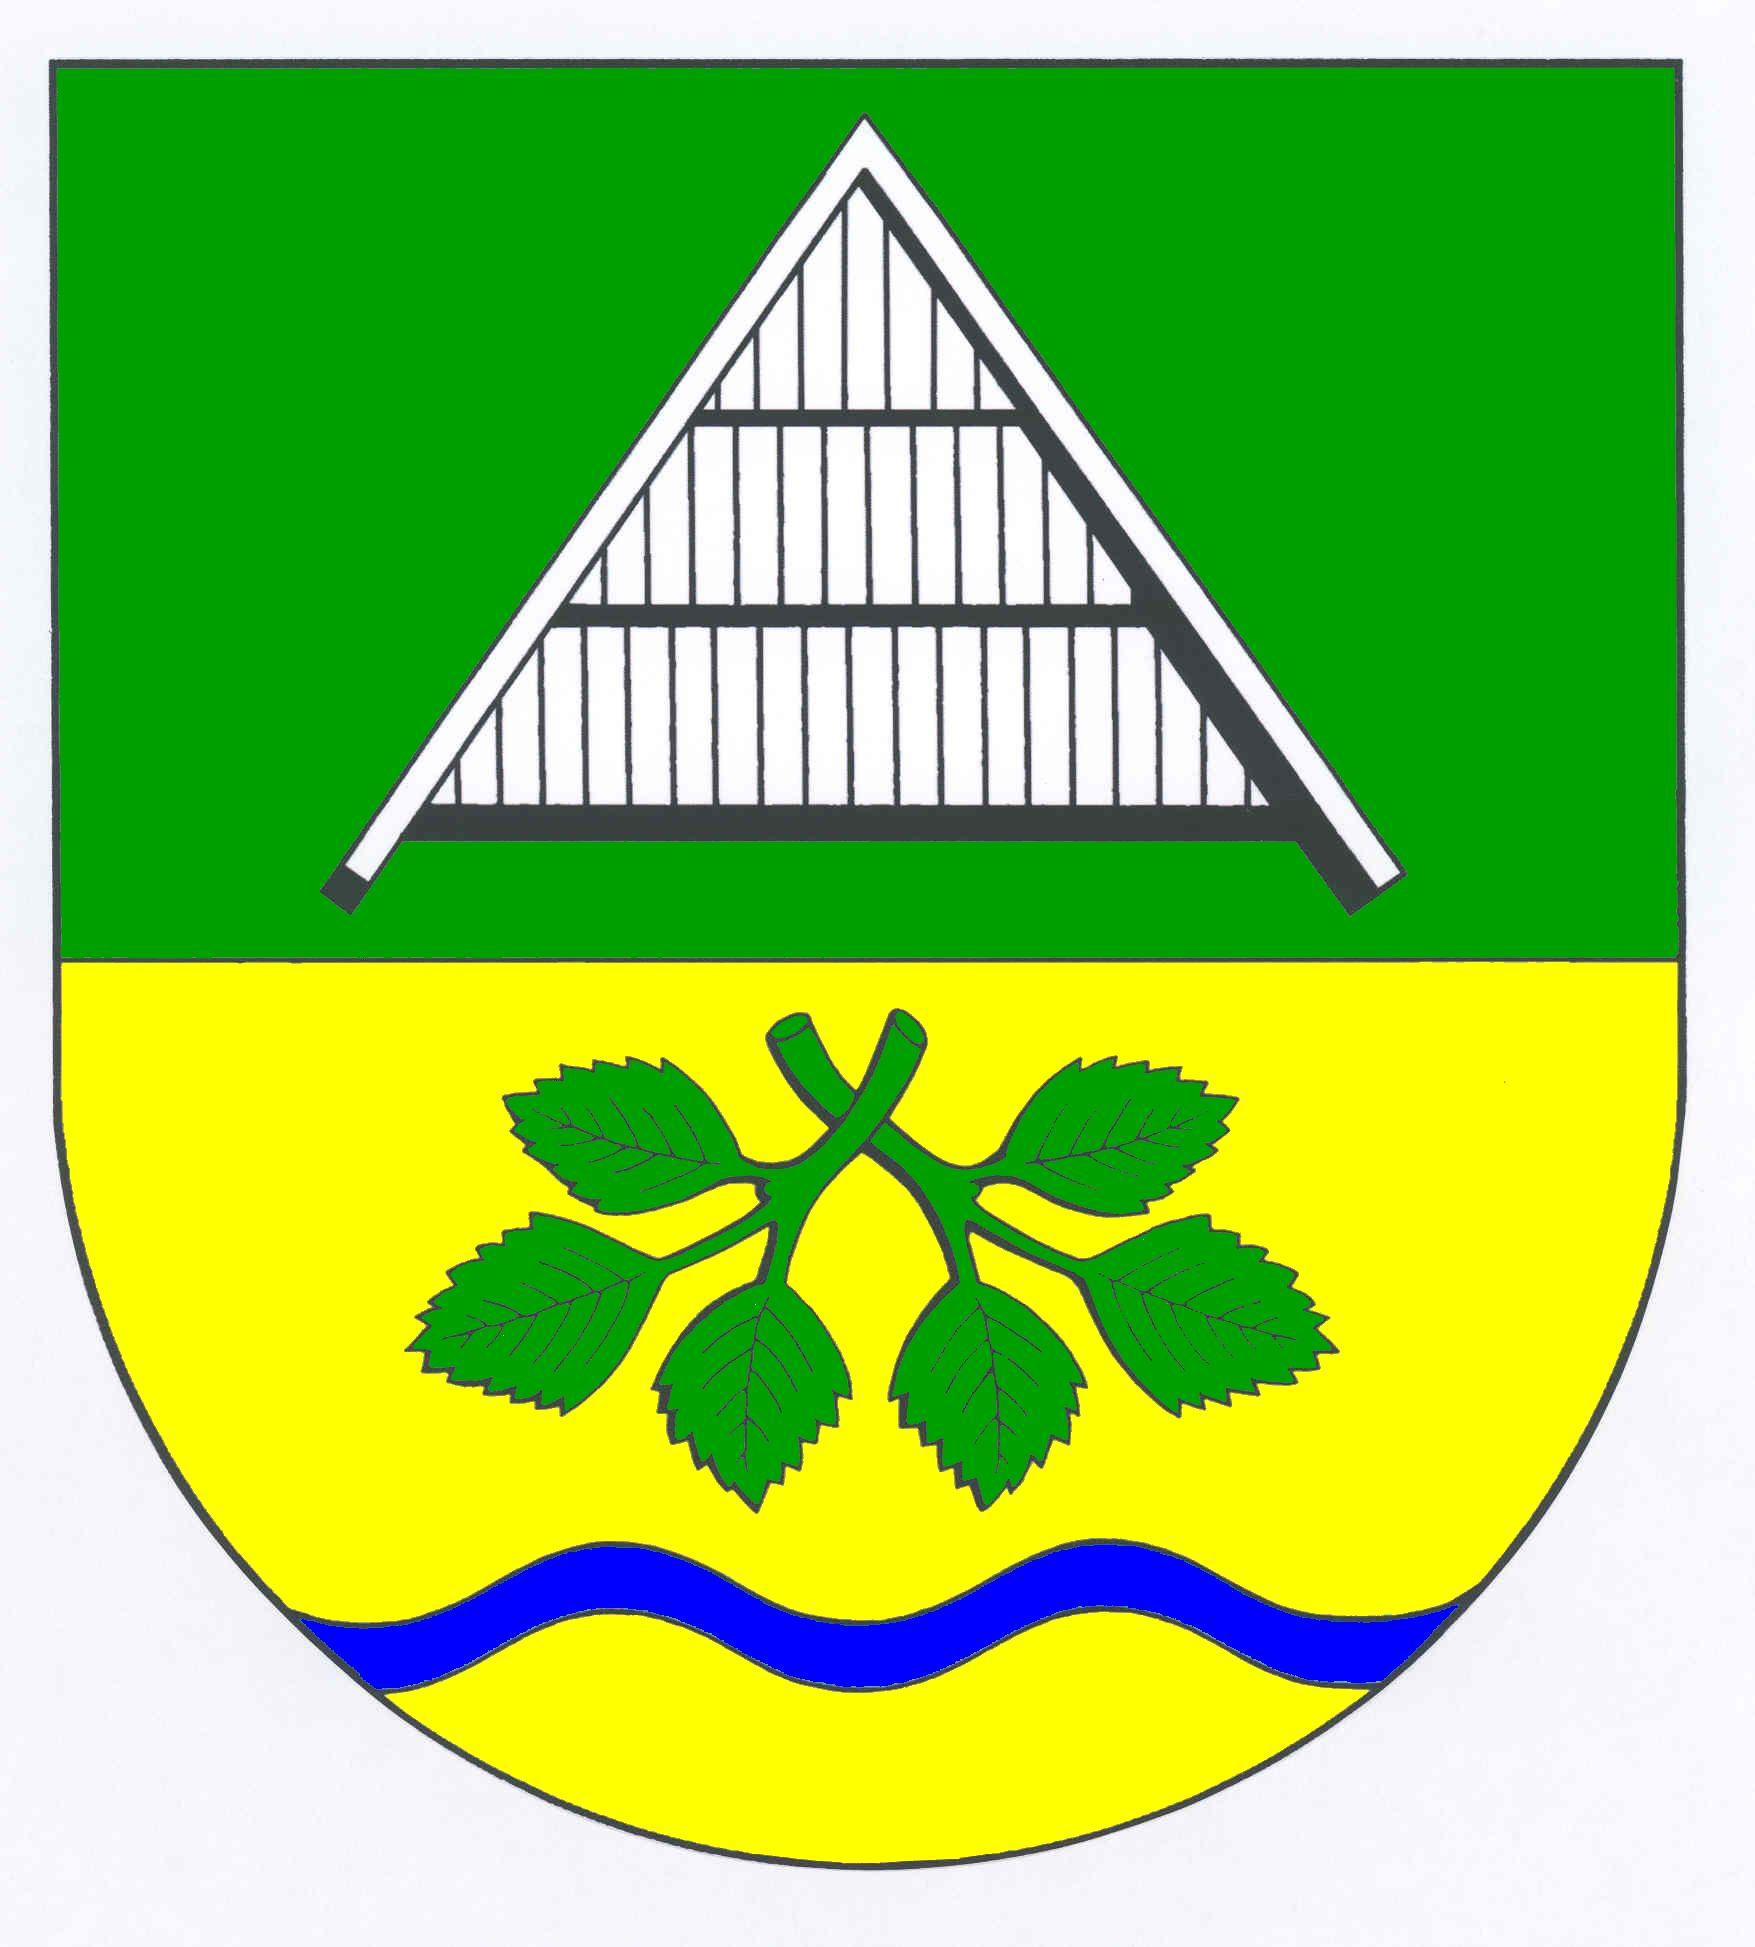 Wappen GemeindeBöhnhusen, Kreis Rendsburg-Eckernförde